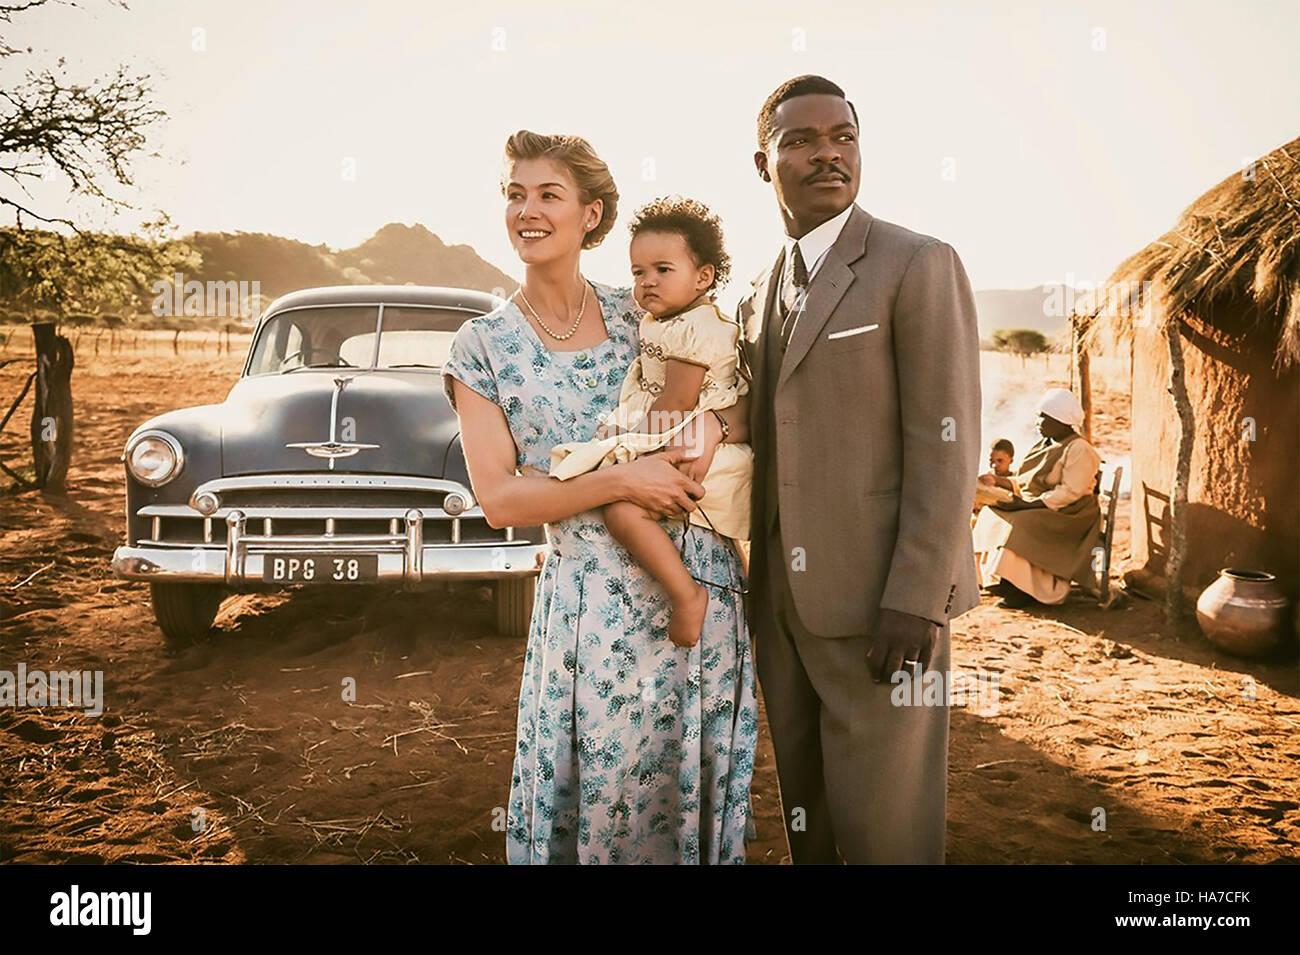 A UNITED KINGDOM 2016 Film United production with Rosamund Pike and David Oyelowo - Stock Image